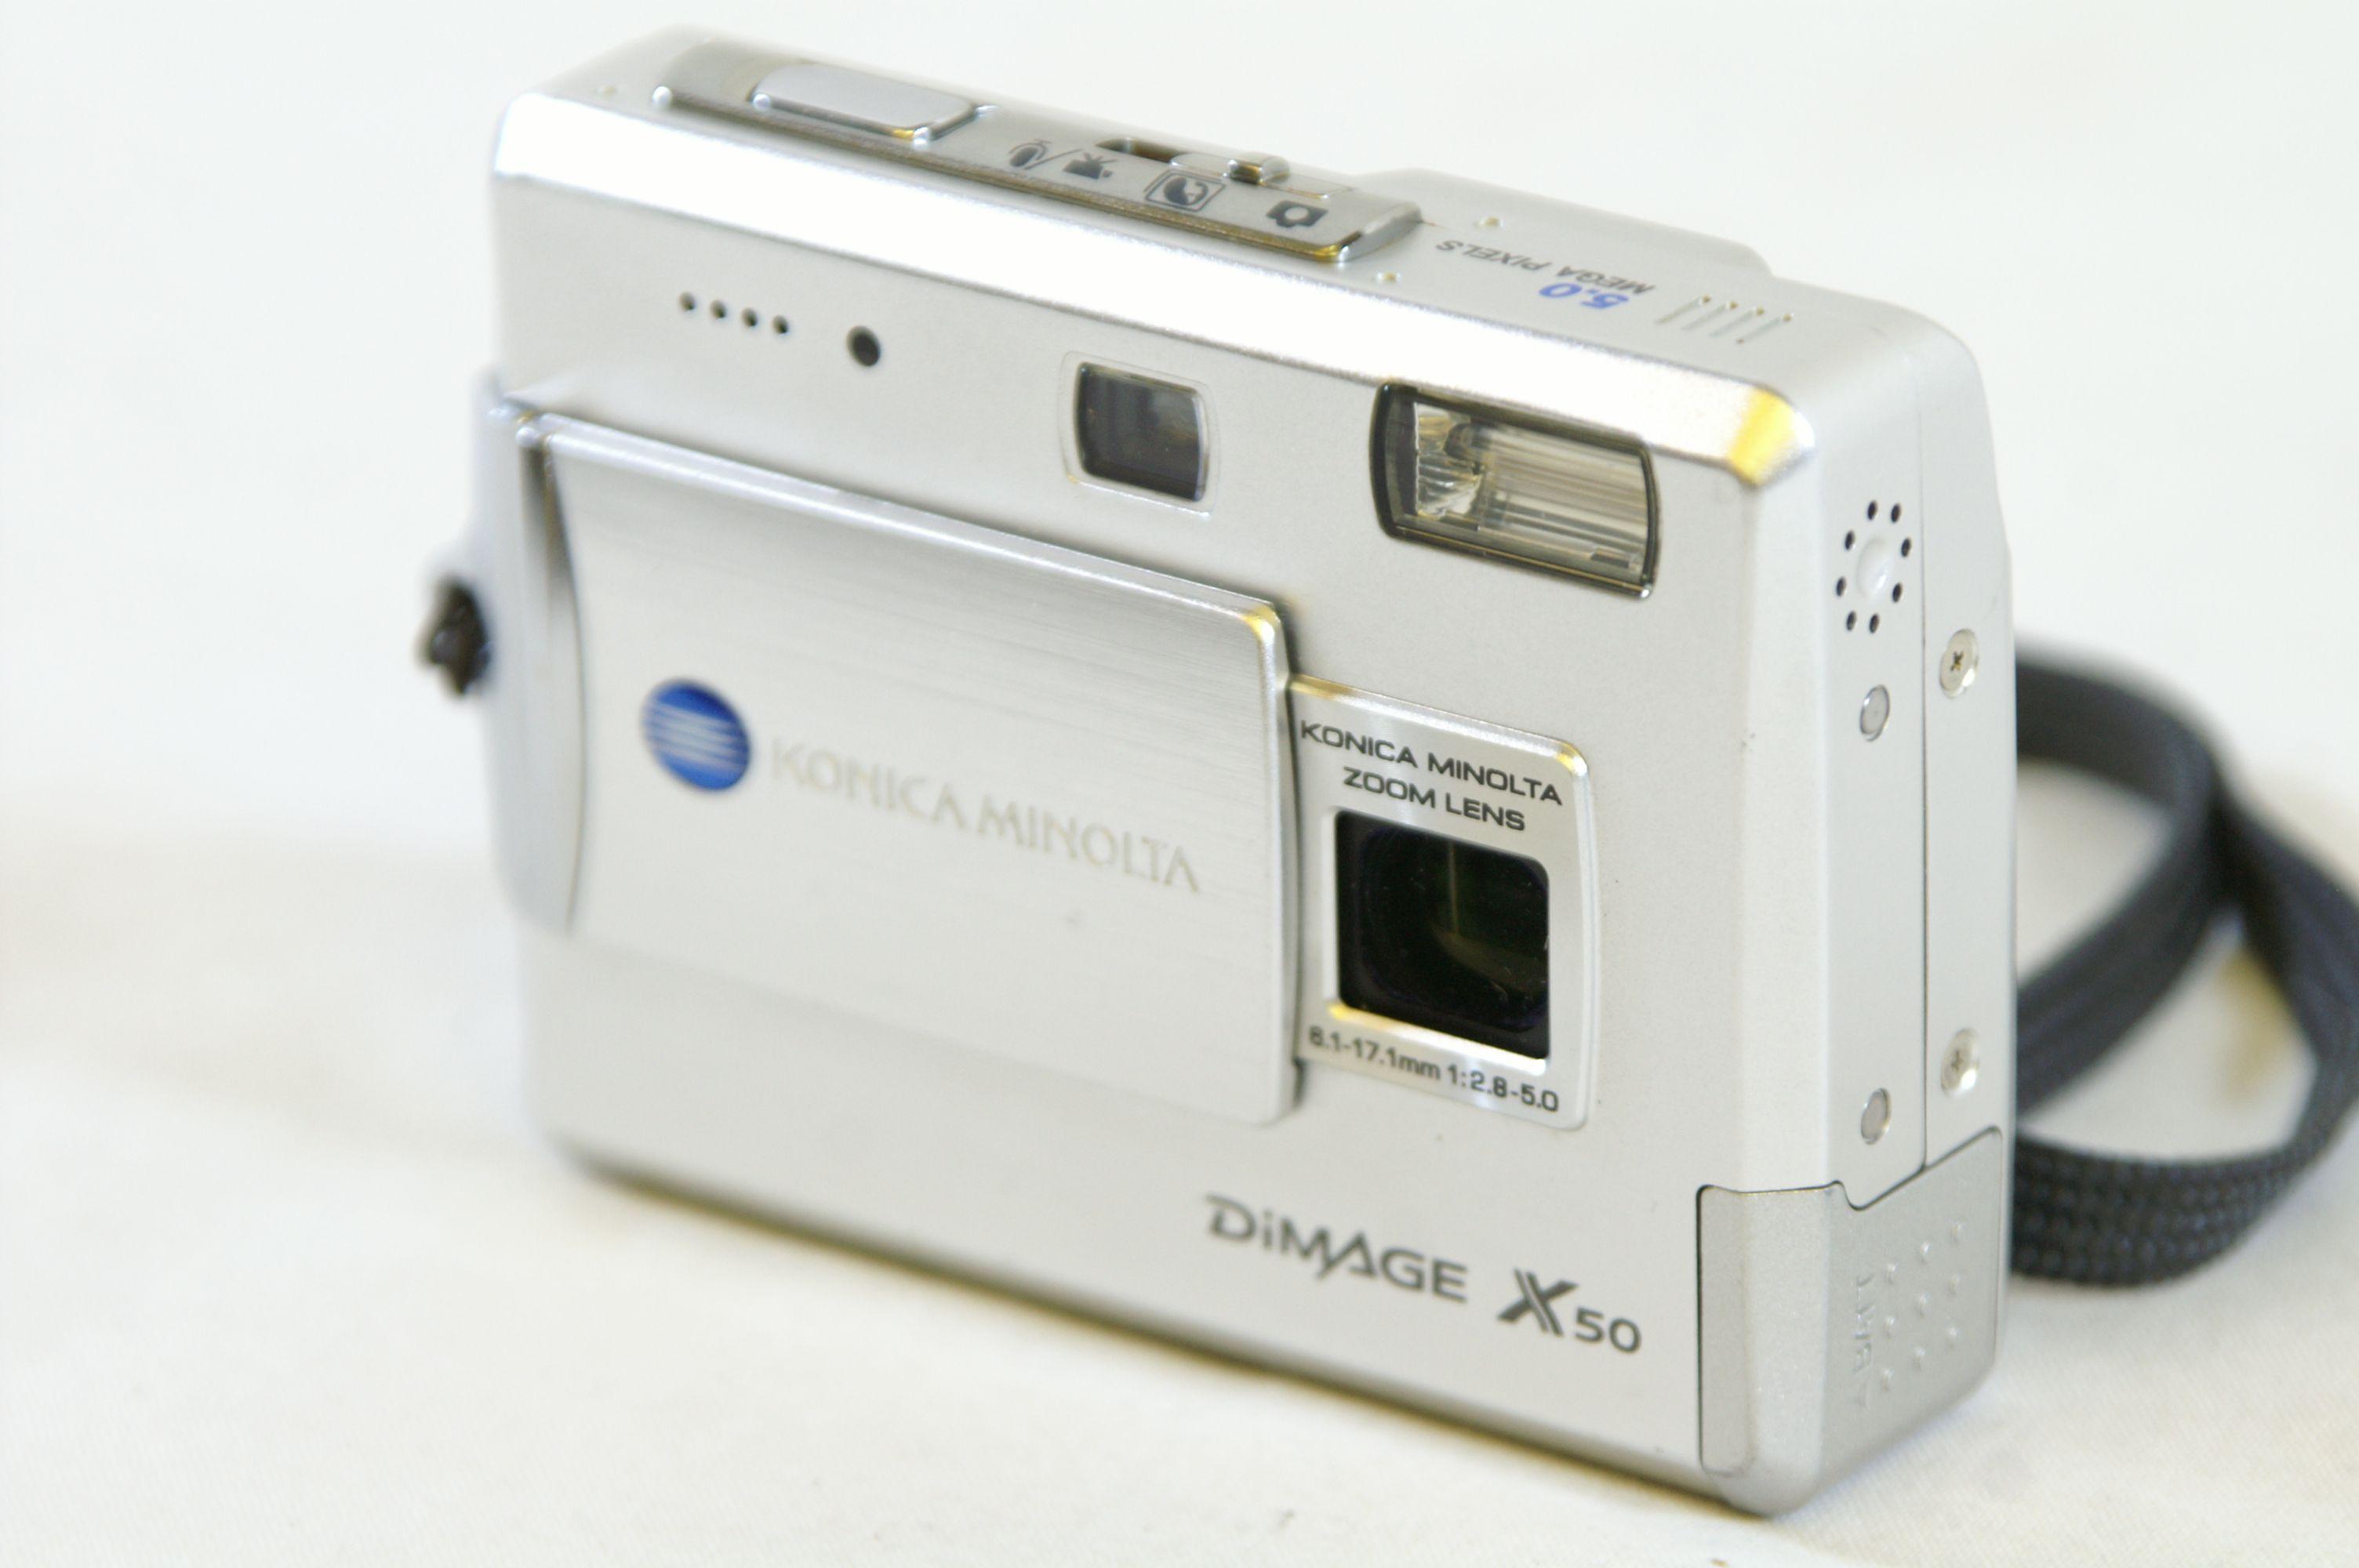 Konica Minolta Dimage X50 5.0MP Digital Camera with SD Card Bundle 2. Open  Full-Size Image